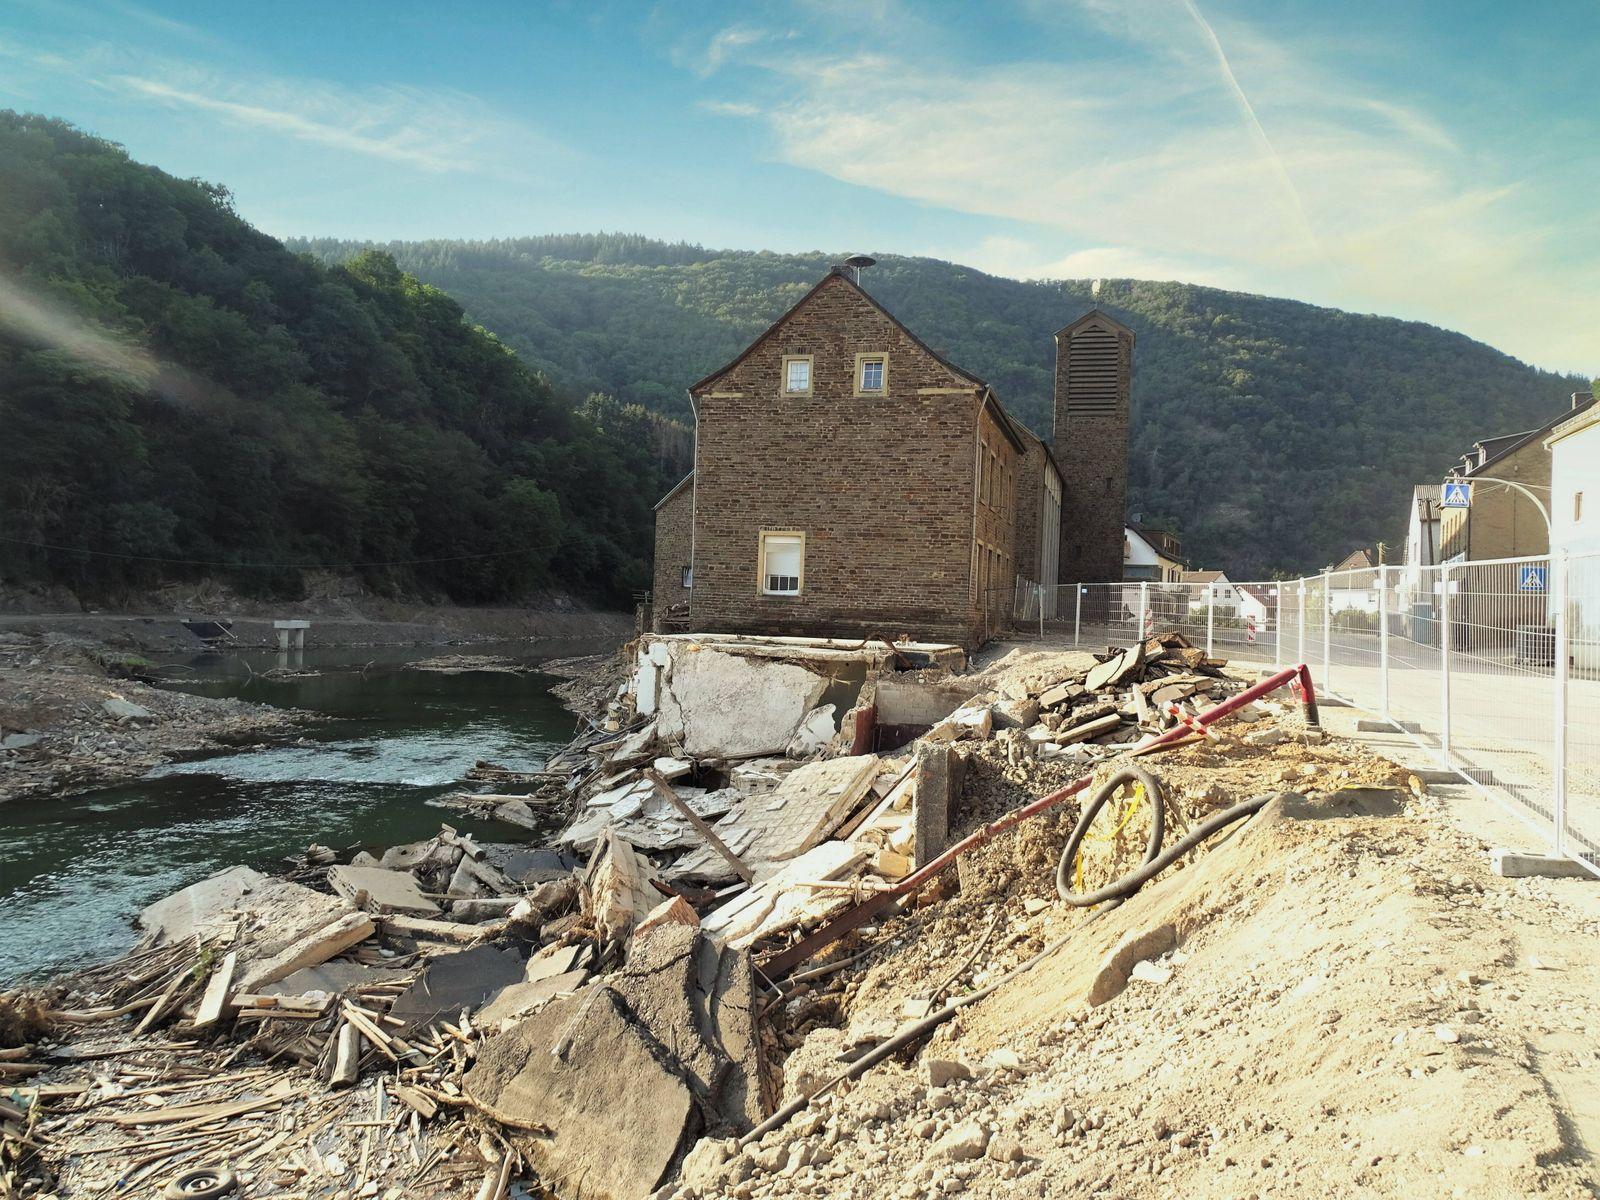 Ahrbrück Themenfoto: Flut, Ahrtal, Aufräumarbeiten, Wiederaufbau, 12.08.2021 Zerstörungen in Ahrbrück, Themenfoto: Flut,